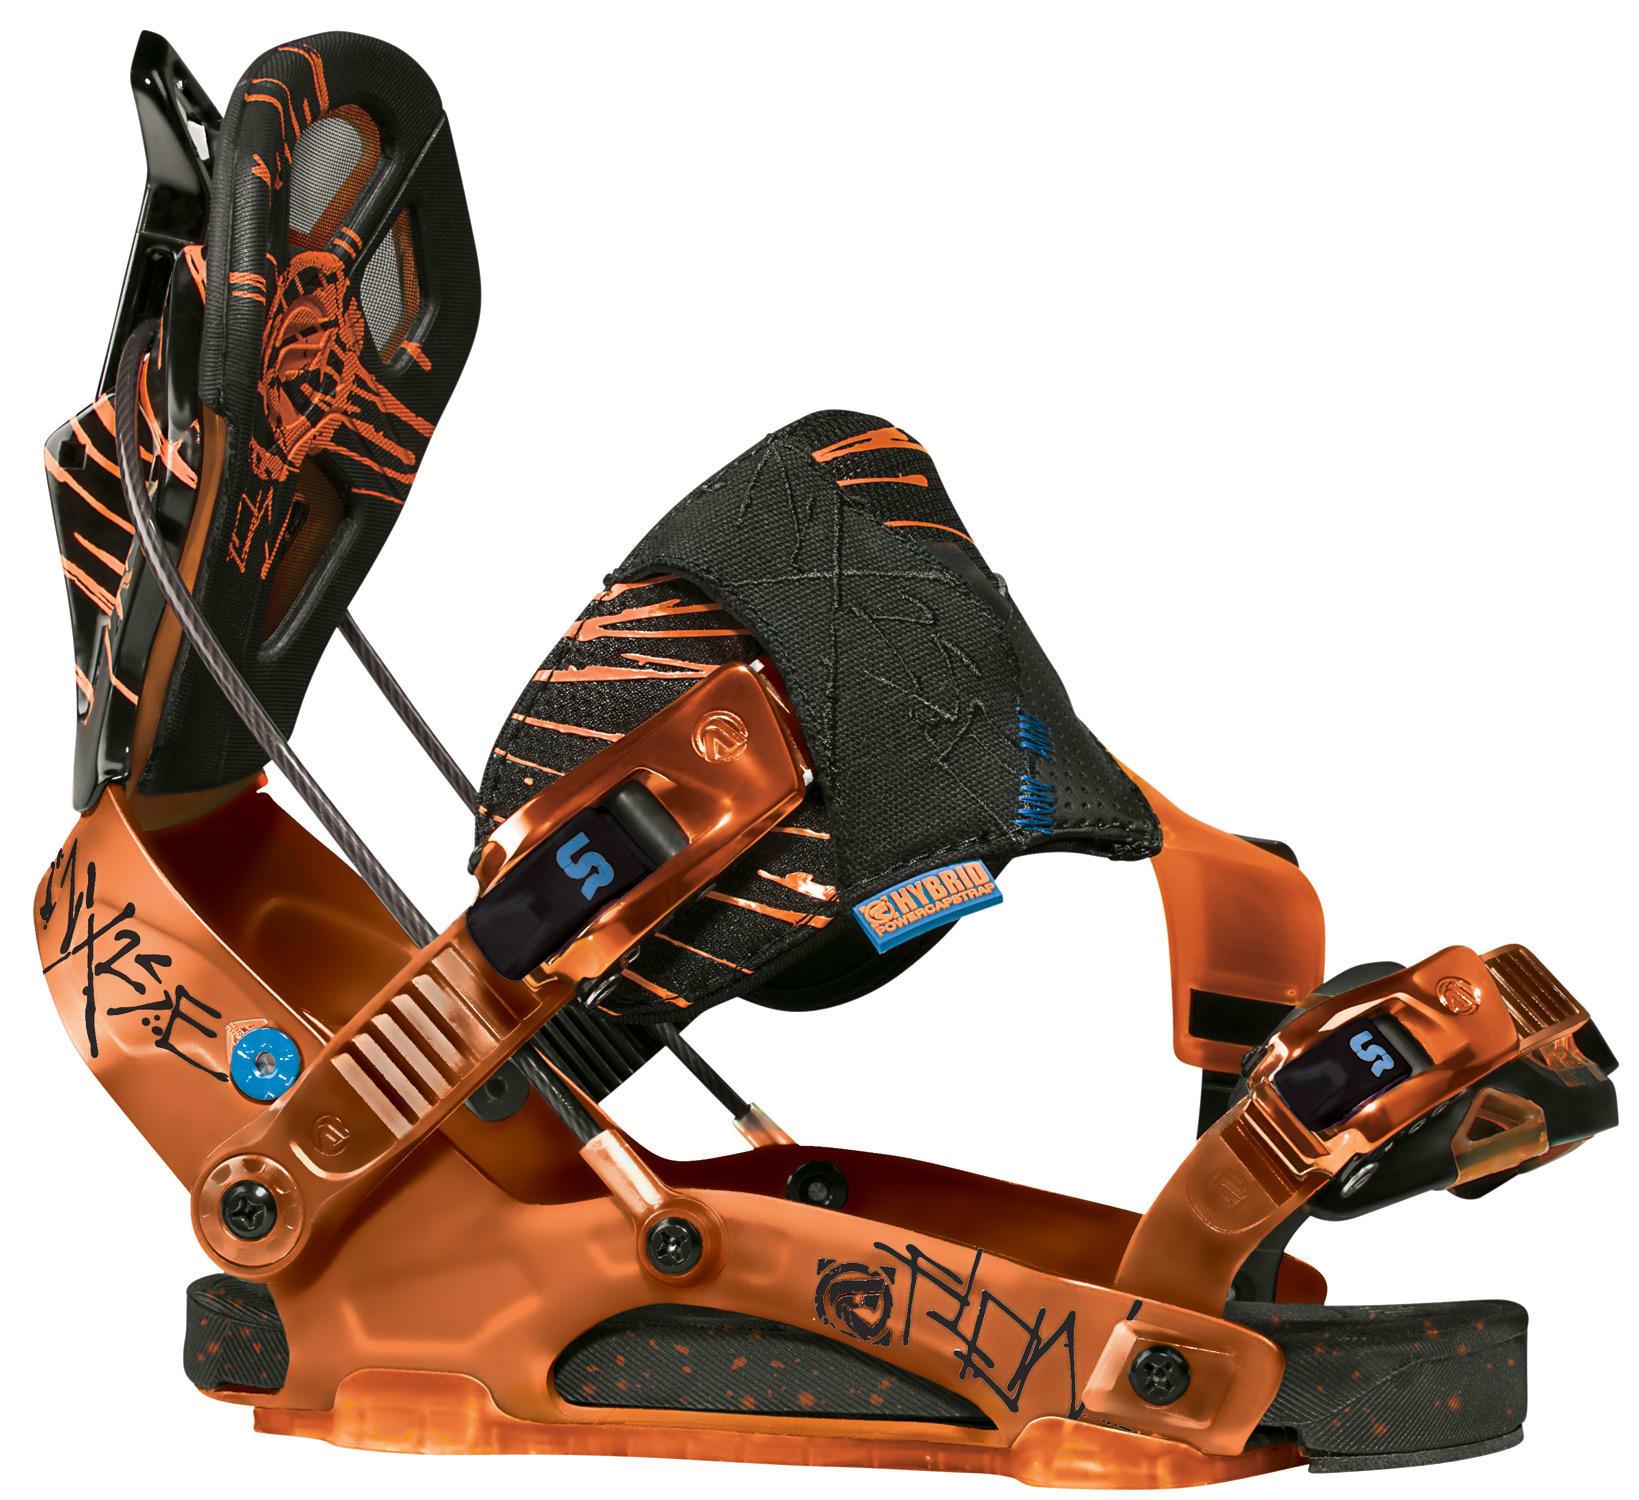 Flow NX2-SE Snowboard Bindings Black/Orange Mens Sz M (4-8